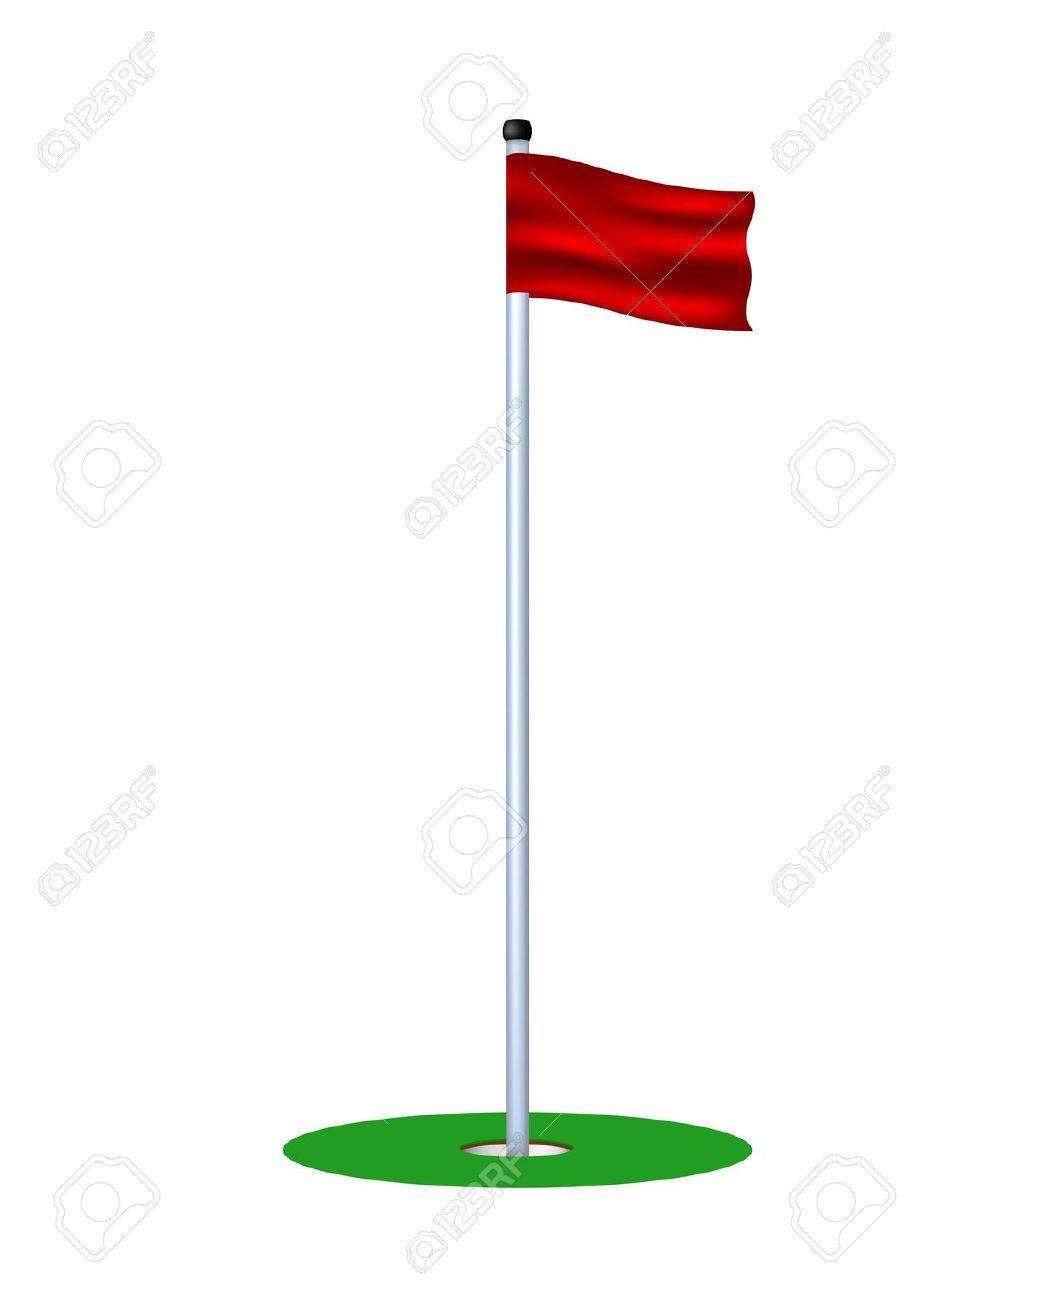 Clipart golf flag clipart free stock 18+ Golf Flag Clip Art | ClipartLook clipart free stock